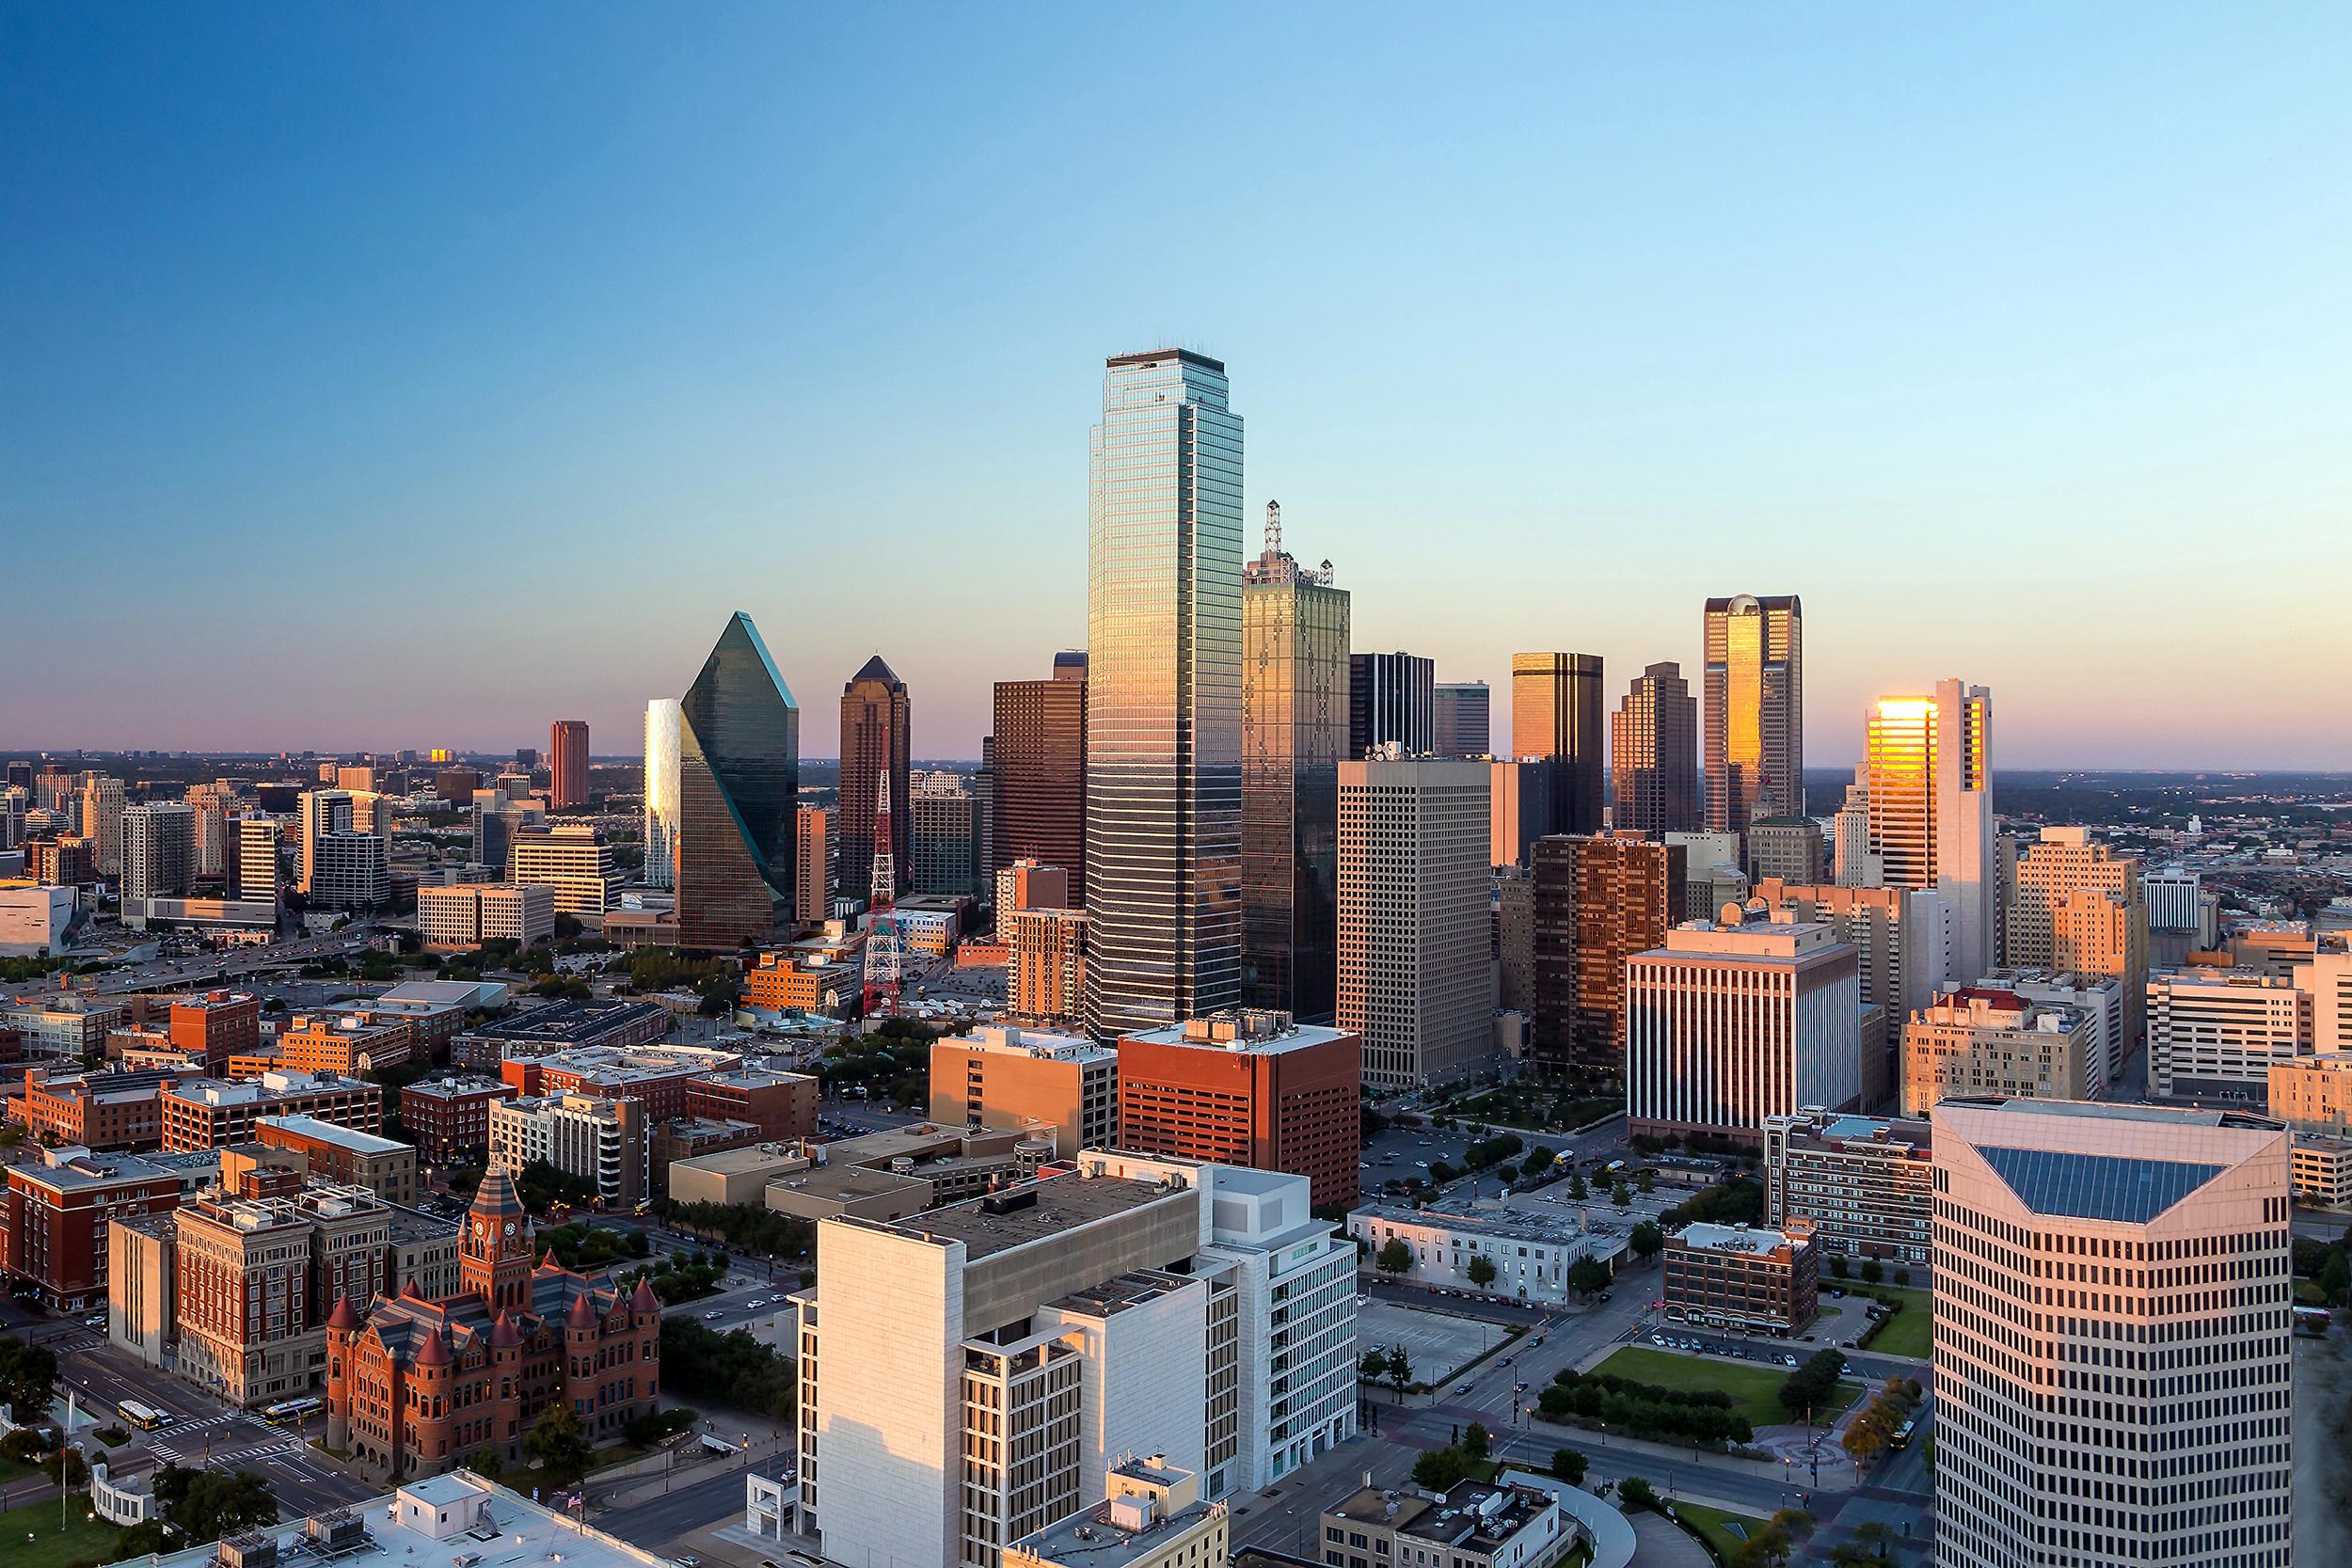 A skyline of Dallas, Texas.